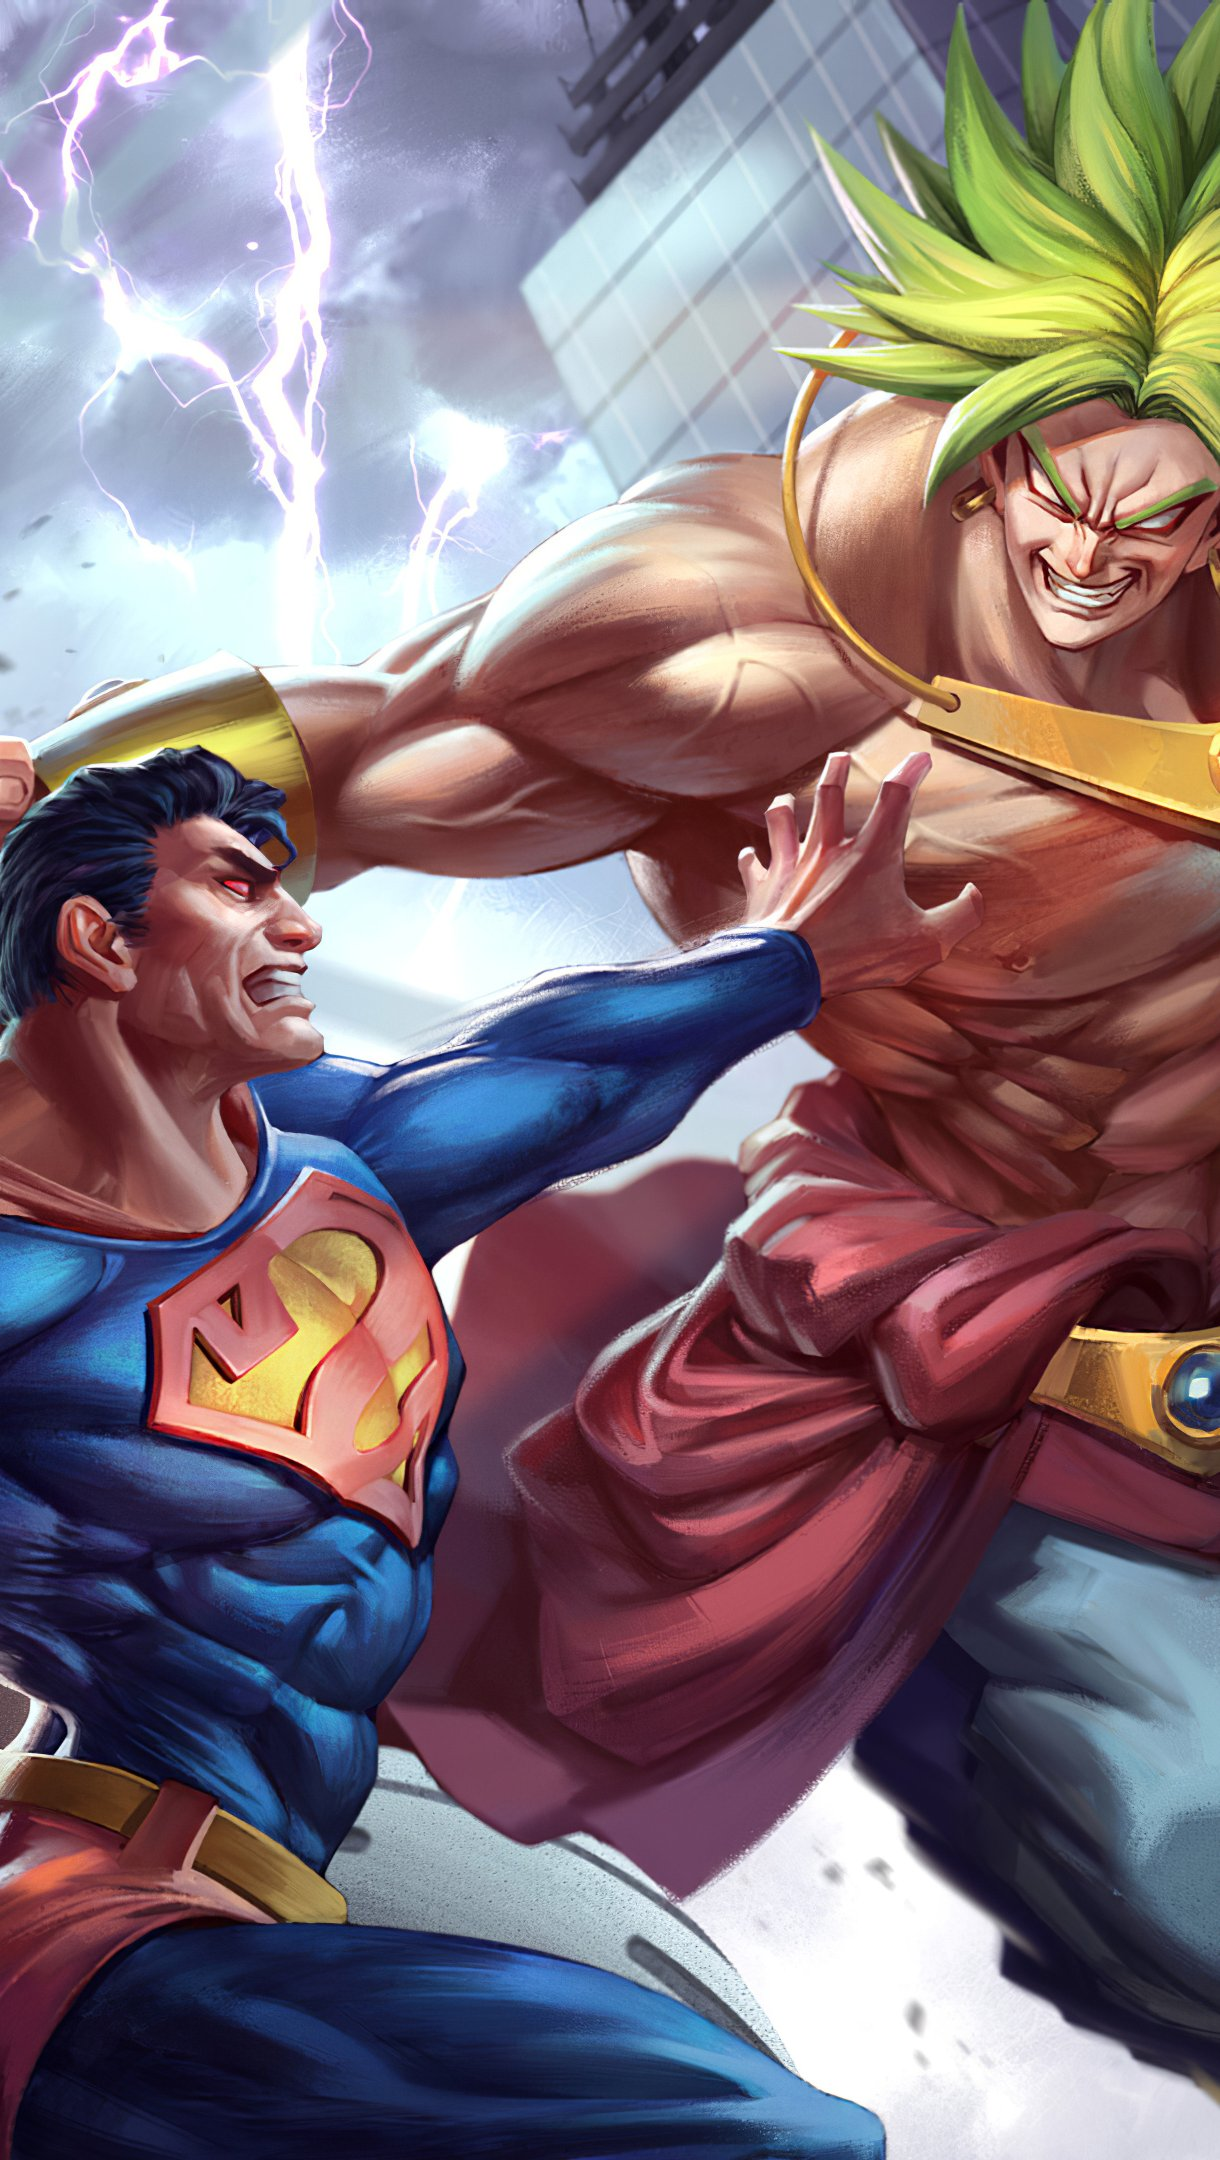 Wallpaper Superman vs Goku Vertical